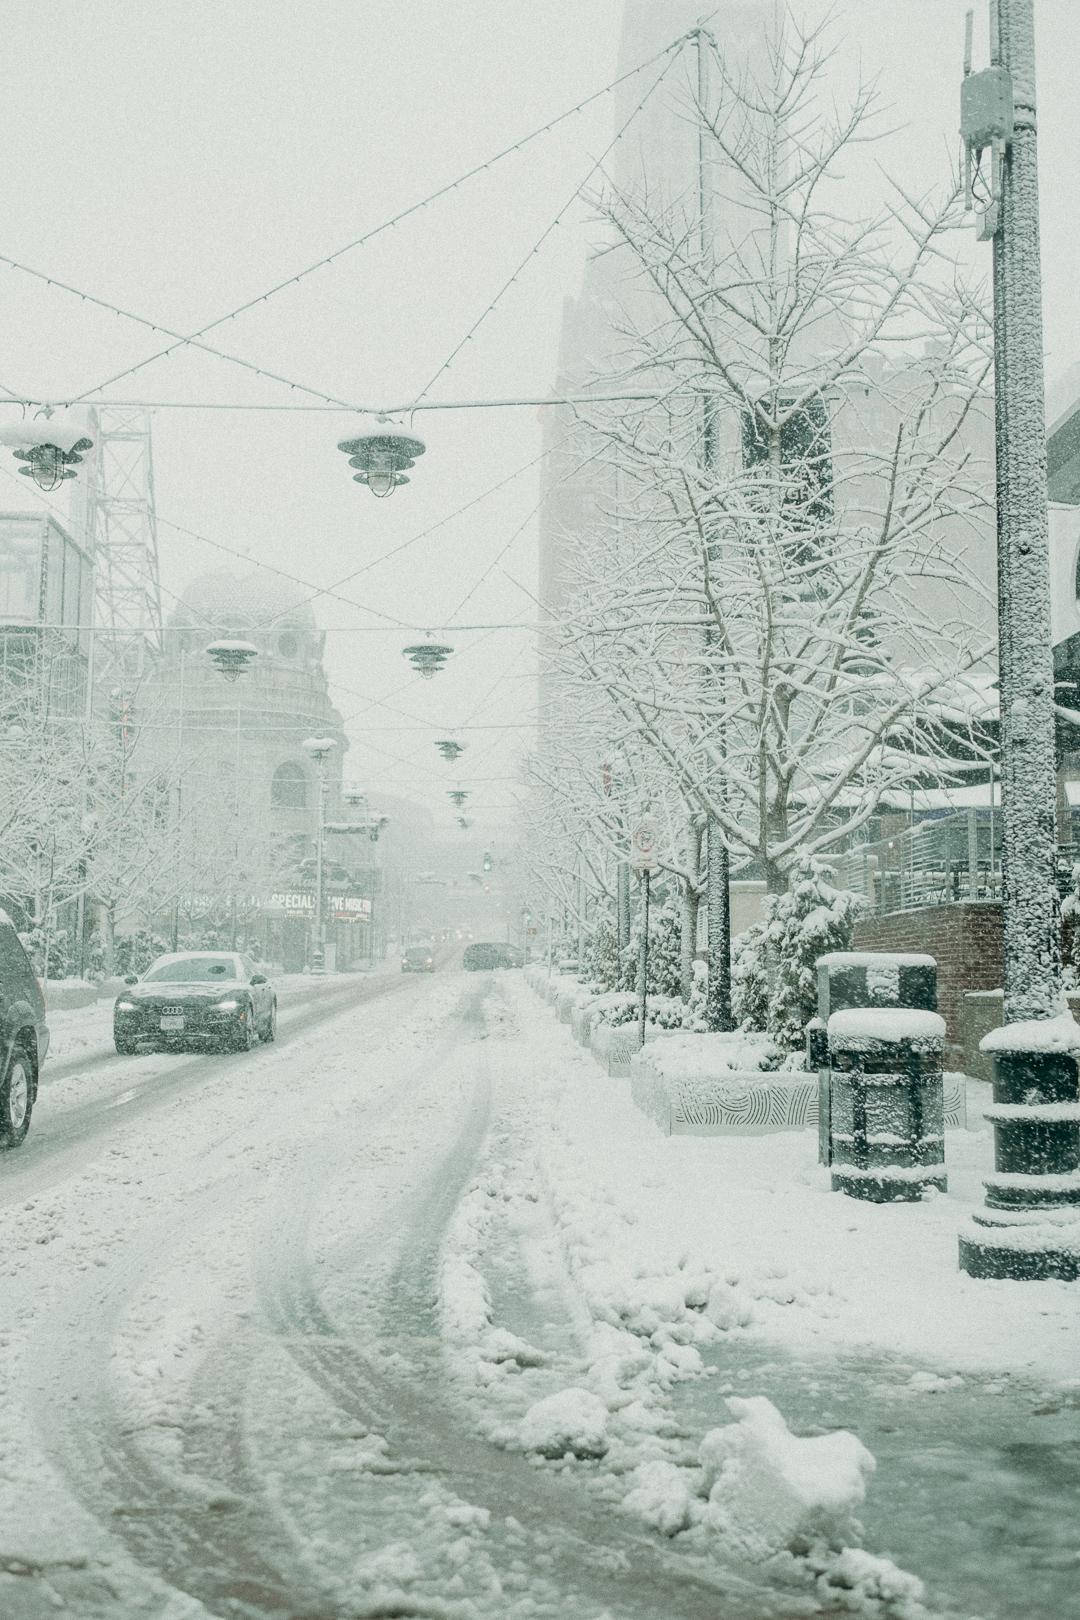 20190112_snowydaysin_kansascity_alihapperphoto_2.jpg